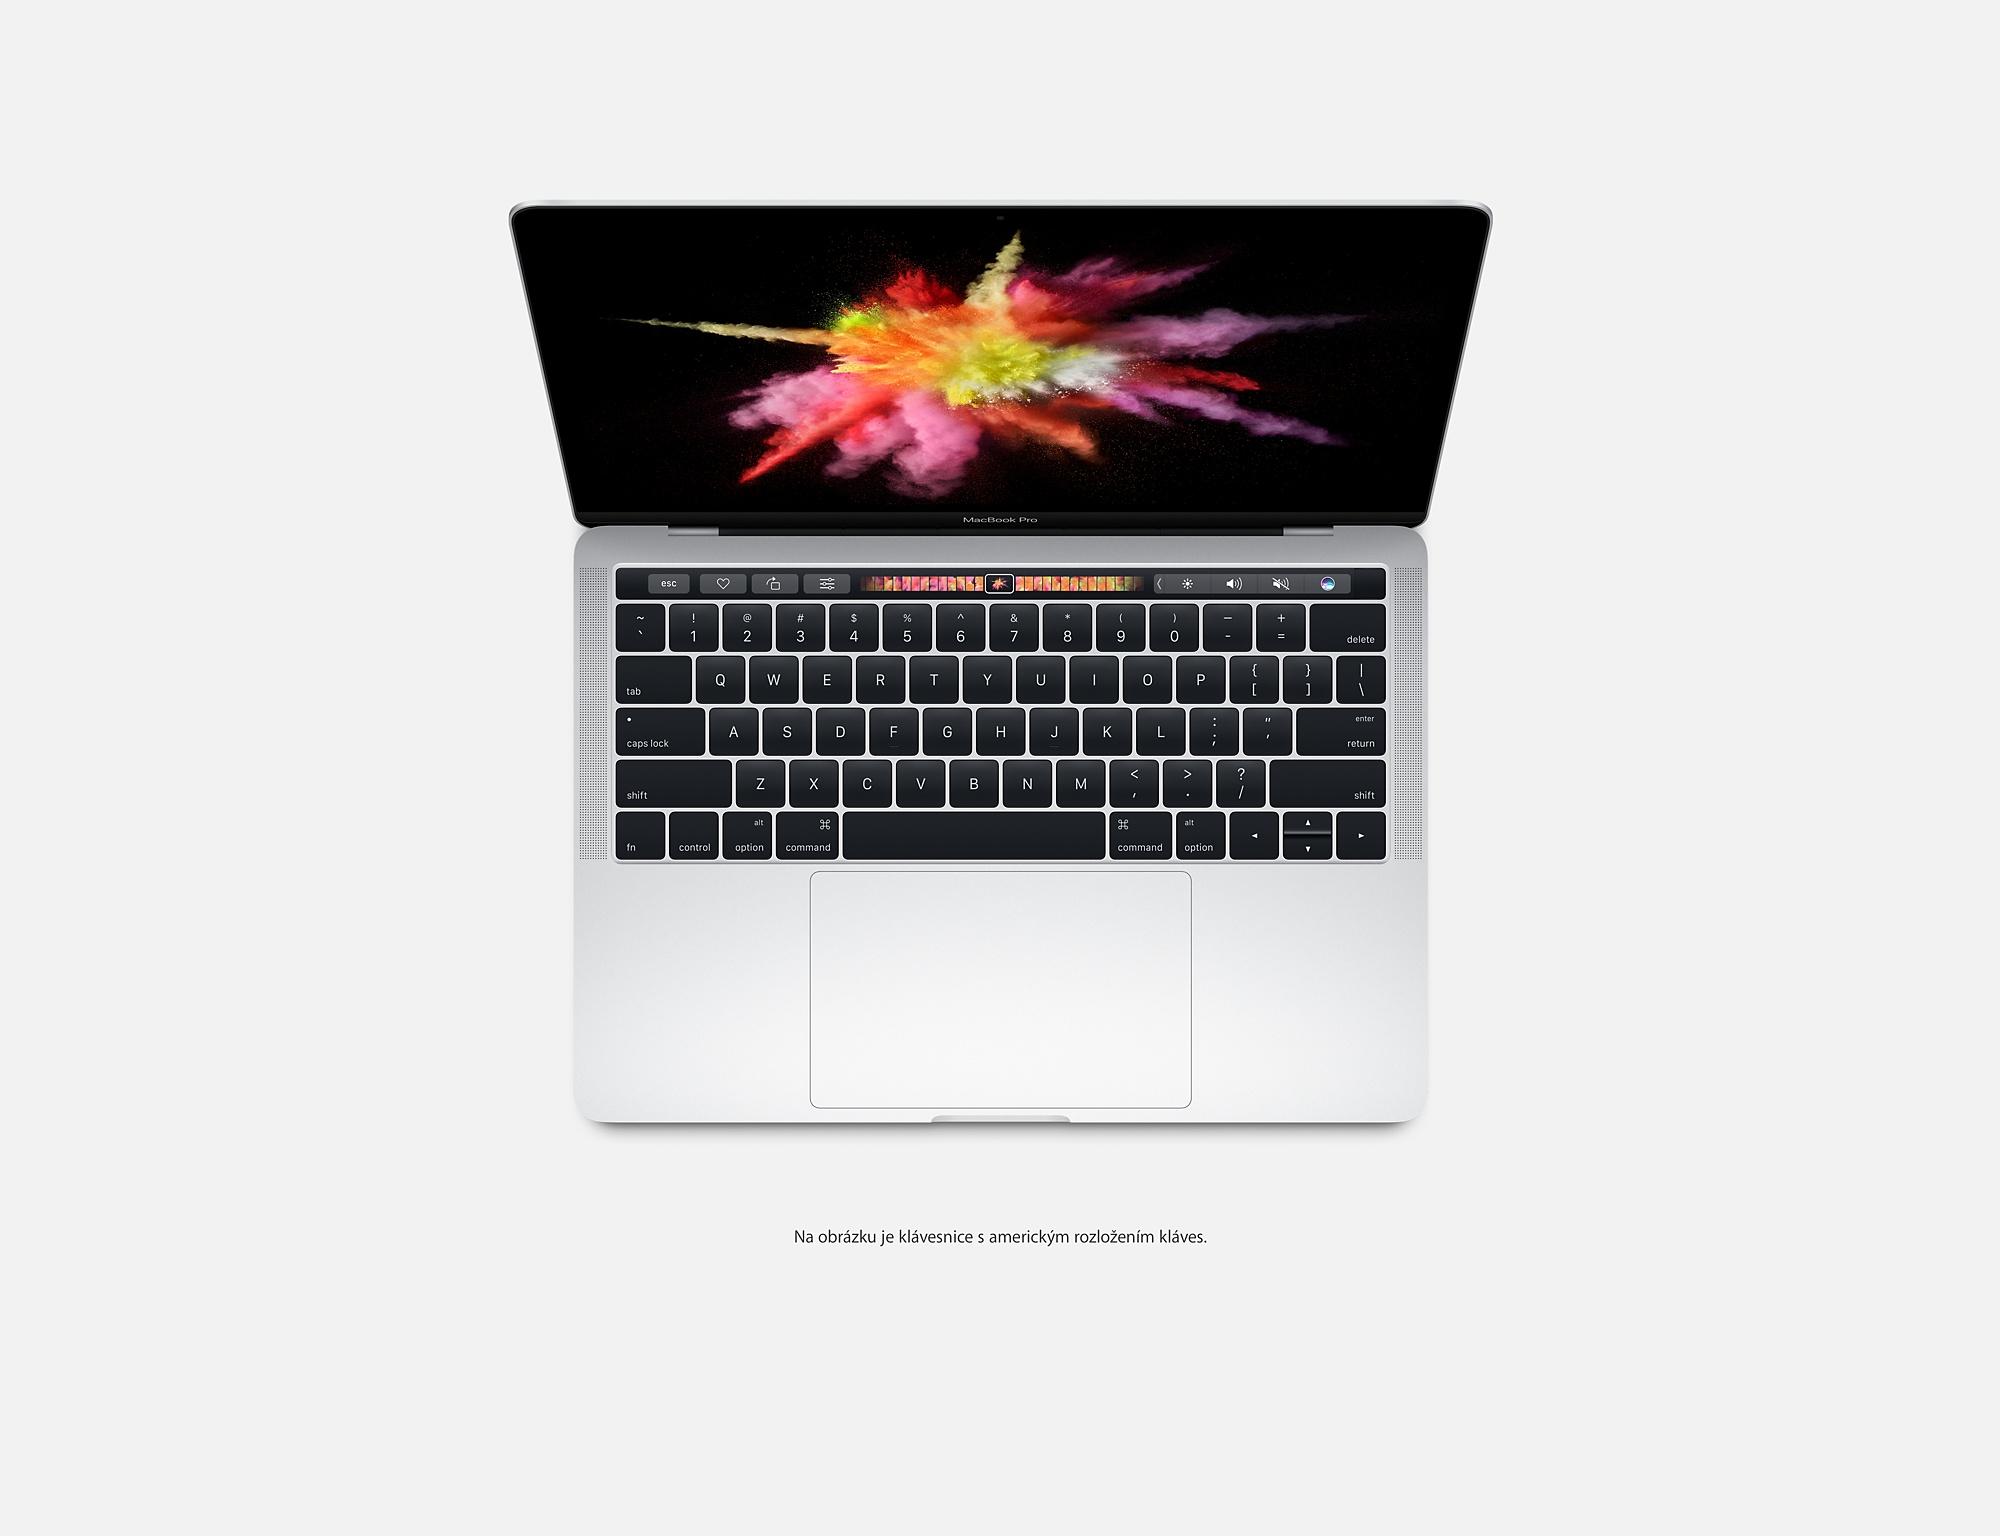 MacBook Pro 13'' i5 2.9GHz/8G/256/TB/SK/Silver